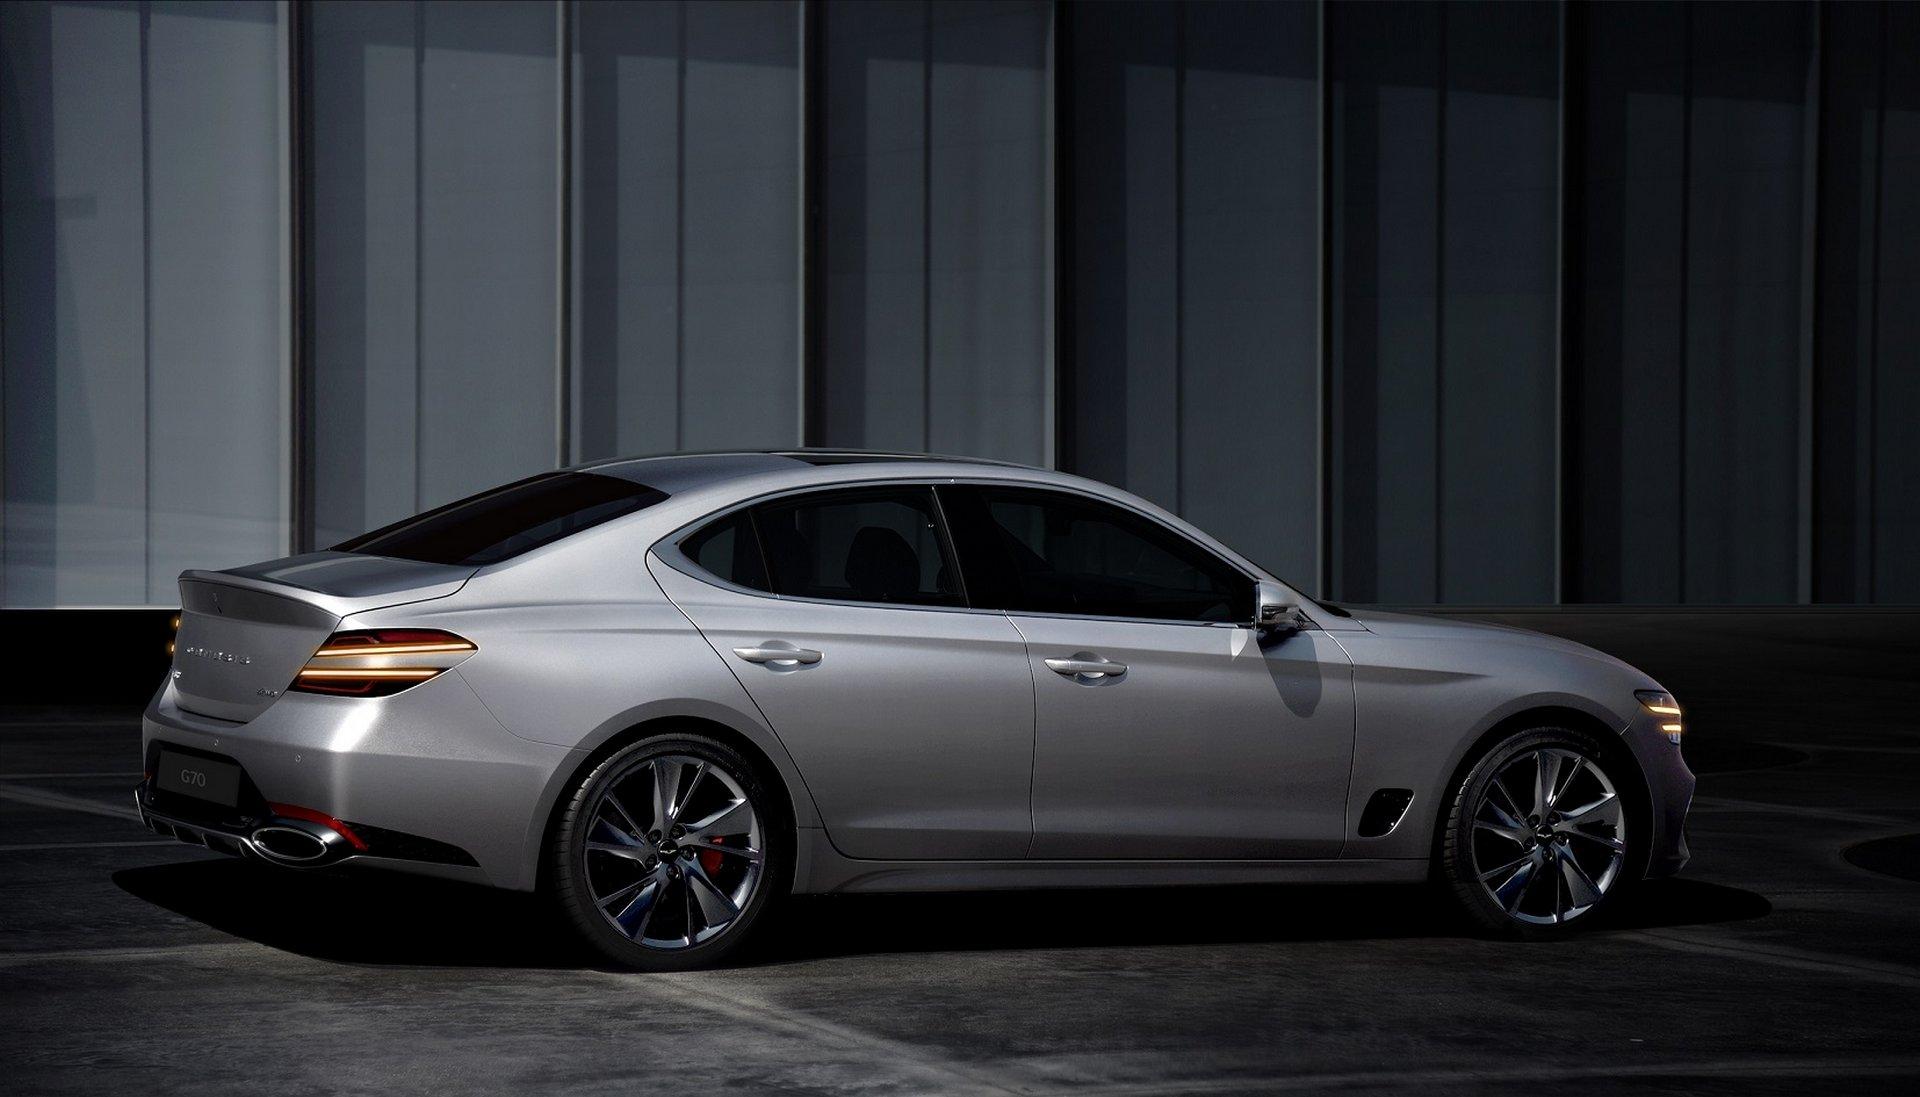 Hyundai Genesis G70 2020 01